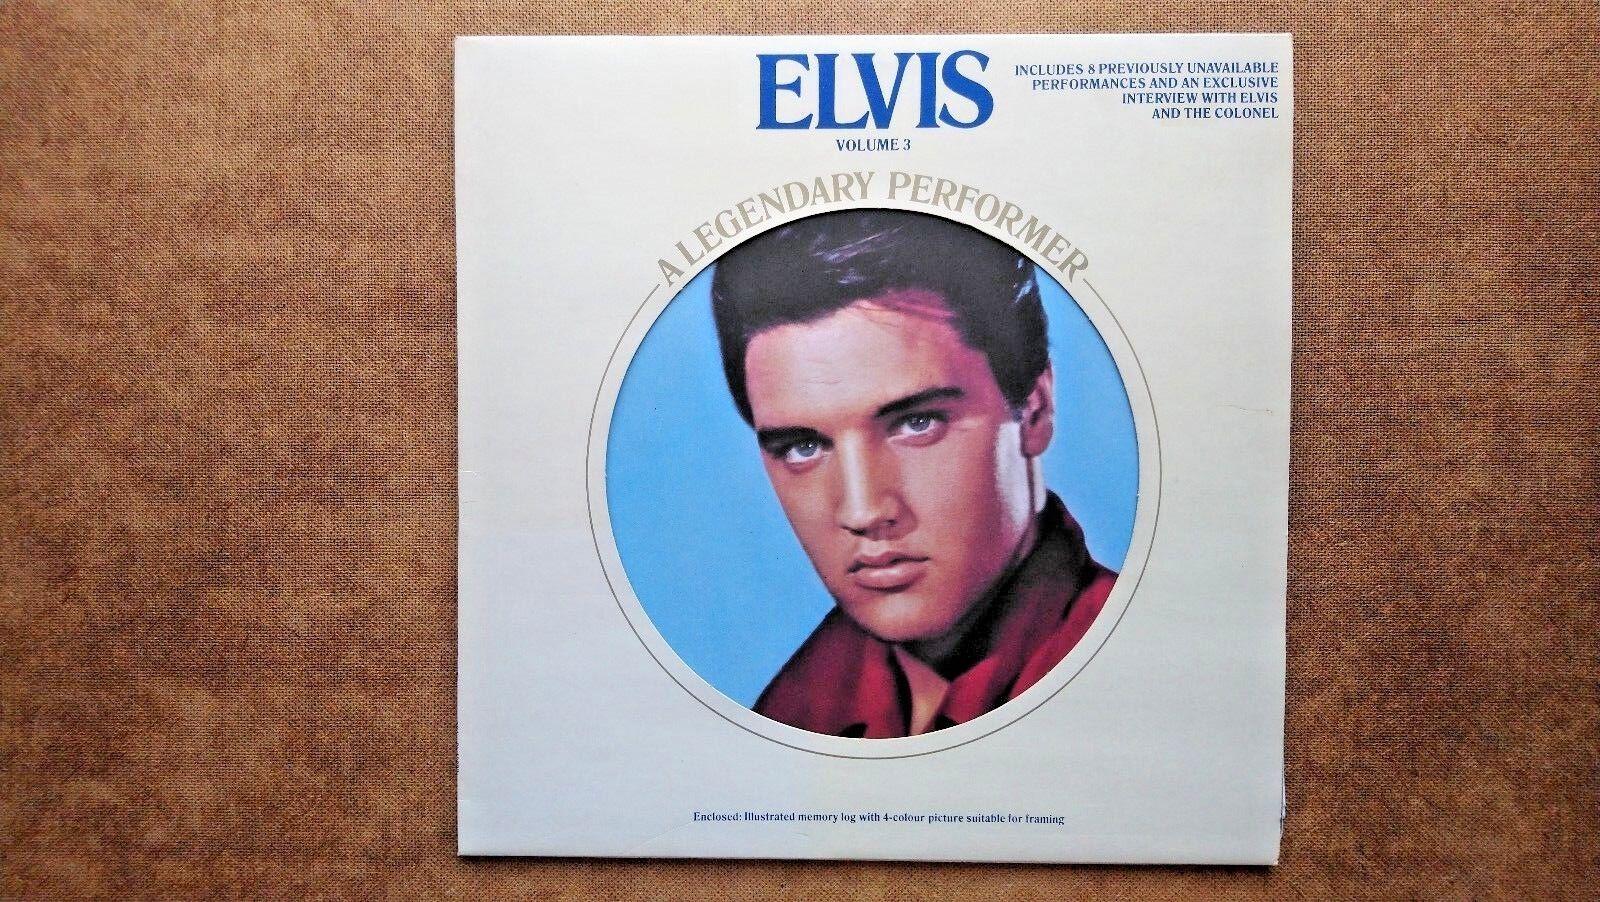 Elvis The legendary Performer - Volume 3 (1978 Edition) LP Vinyl Record